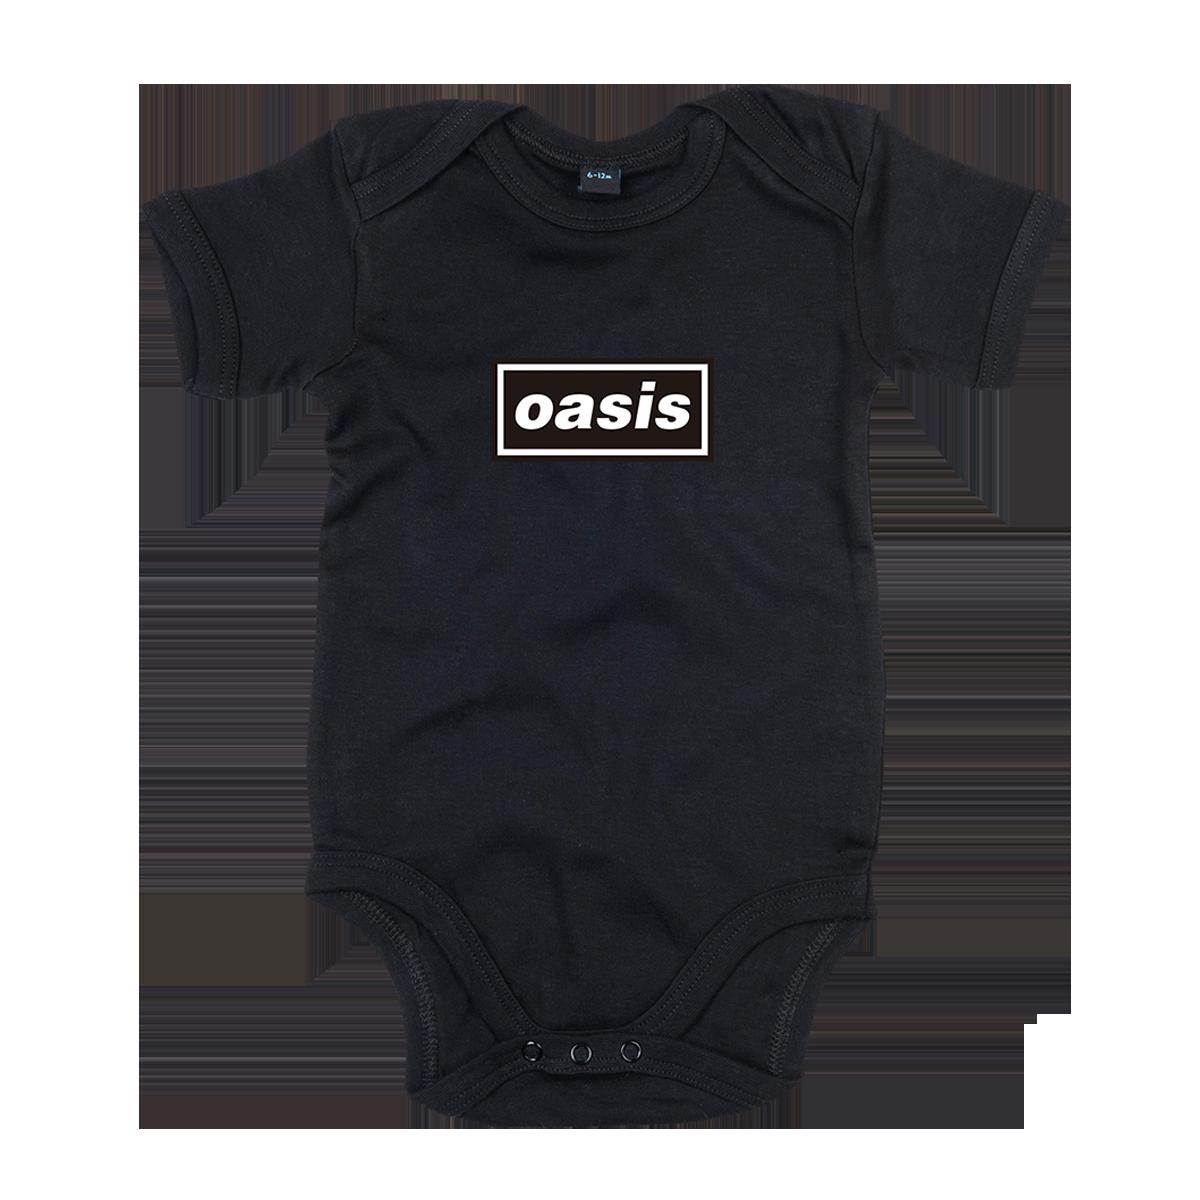 Buy Online Oasis - Baby Grow (Black)